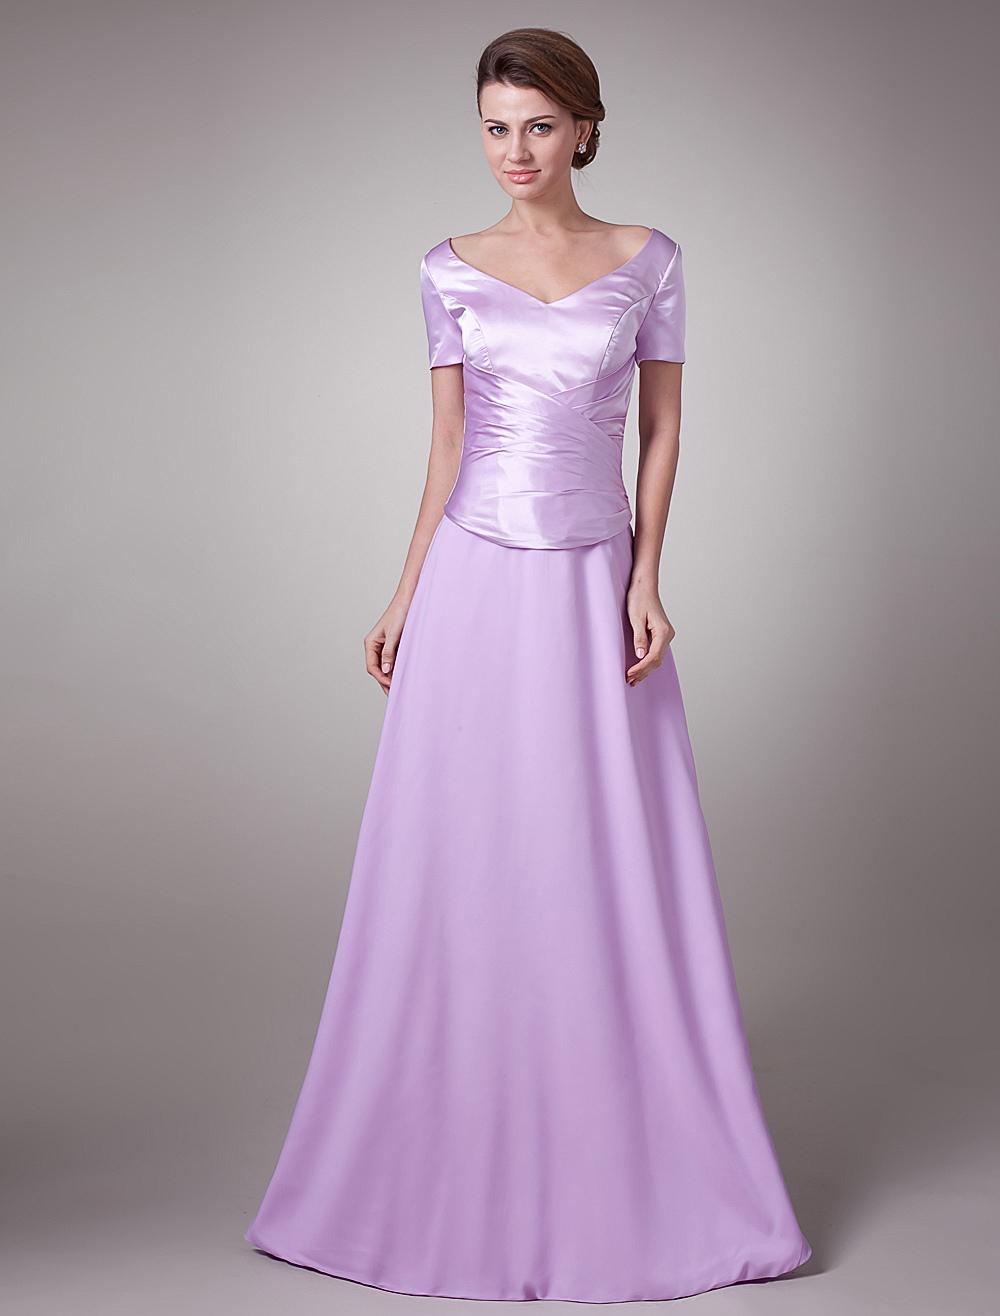 Short Sleeves V-Neck Draped Waist Long Mother of the Bride Dress